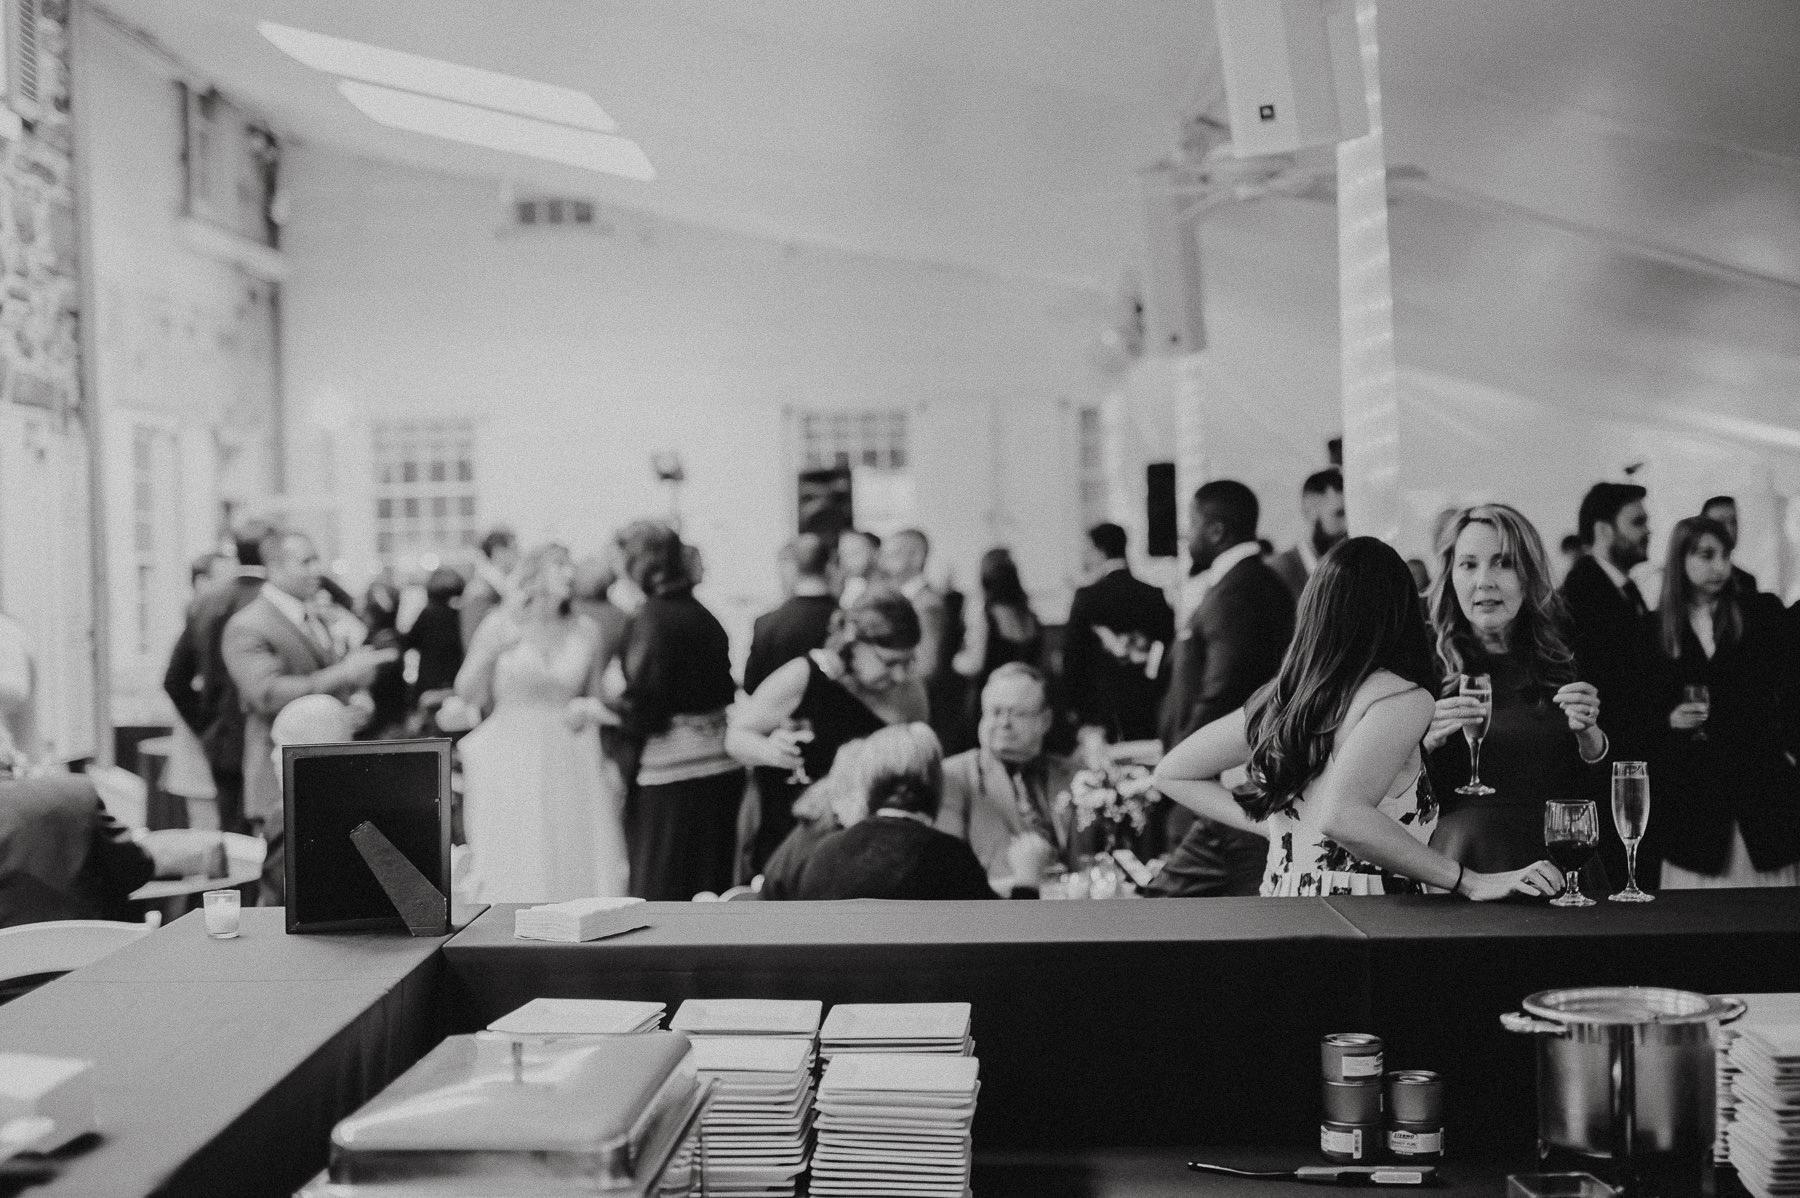 appleford-estate-wedding-photography-78.jpg